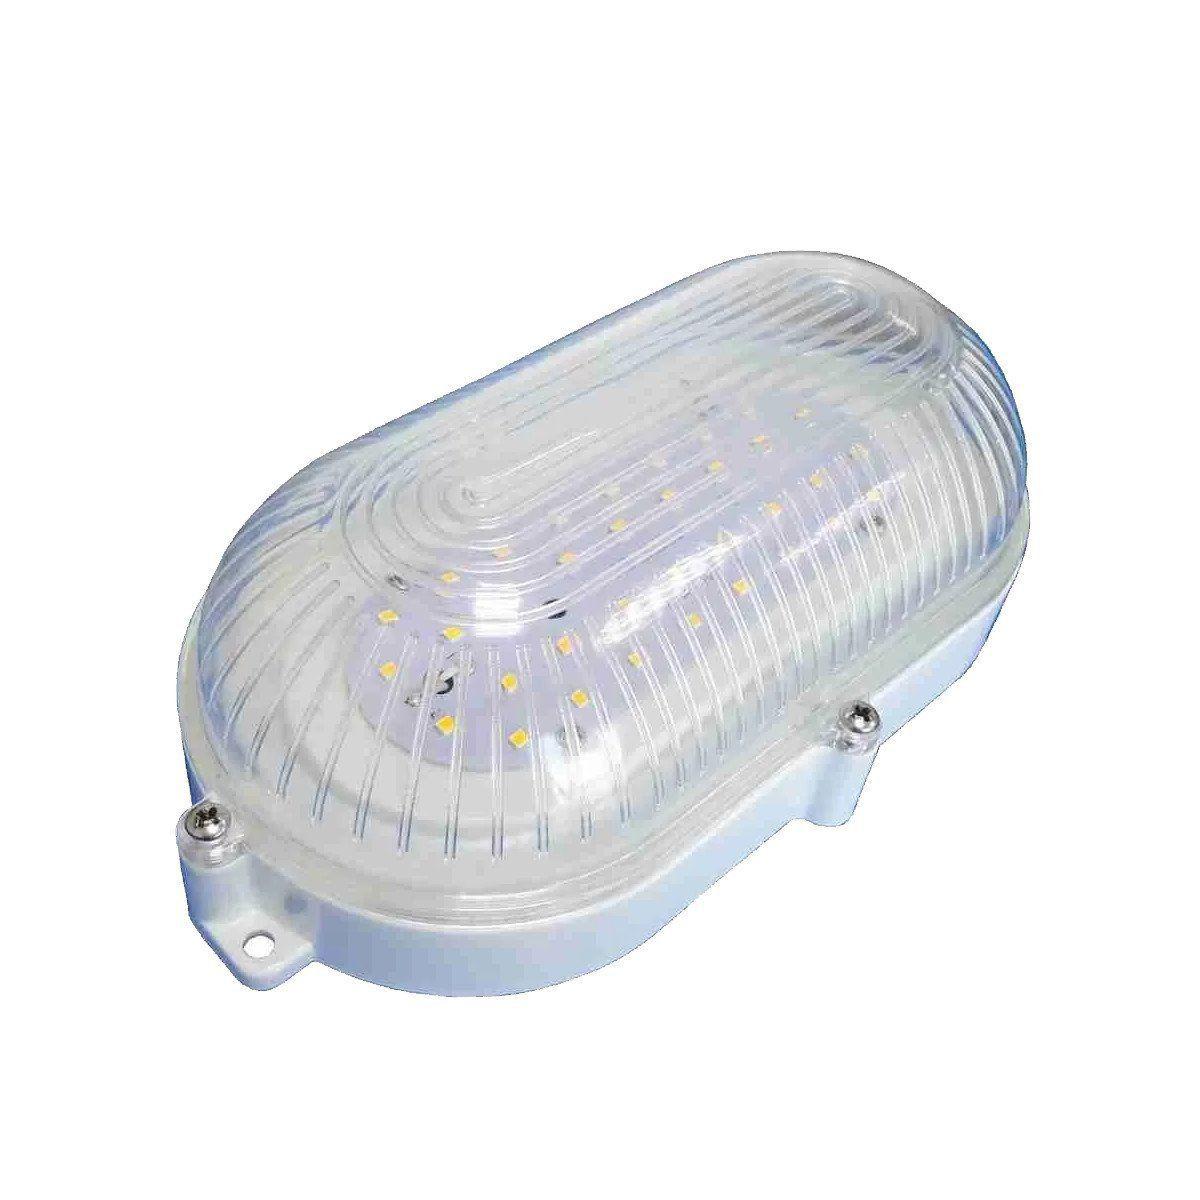 Luminária Arandela Tartaruga 7W Carcaça Branca Bivolt - 6200